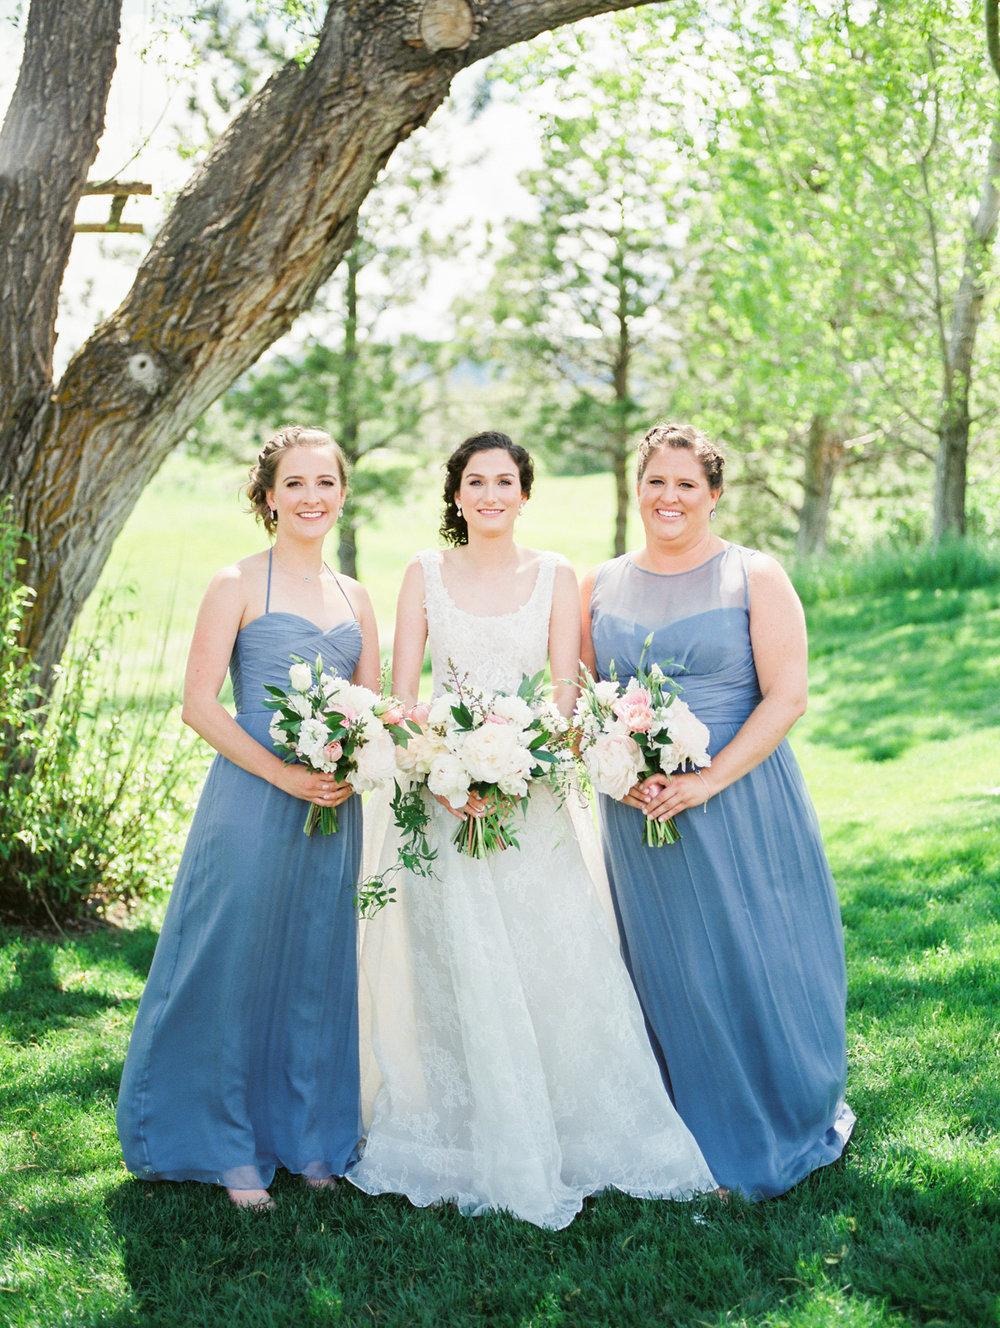 Spruce Mauntain Ranch Wedding Photographer0003-2.jpg